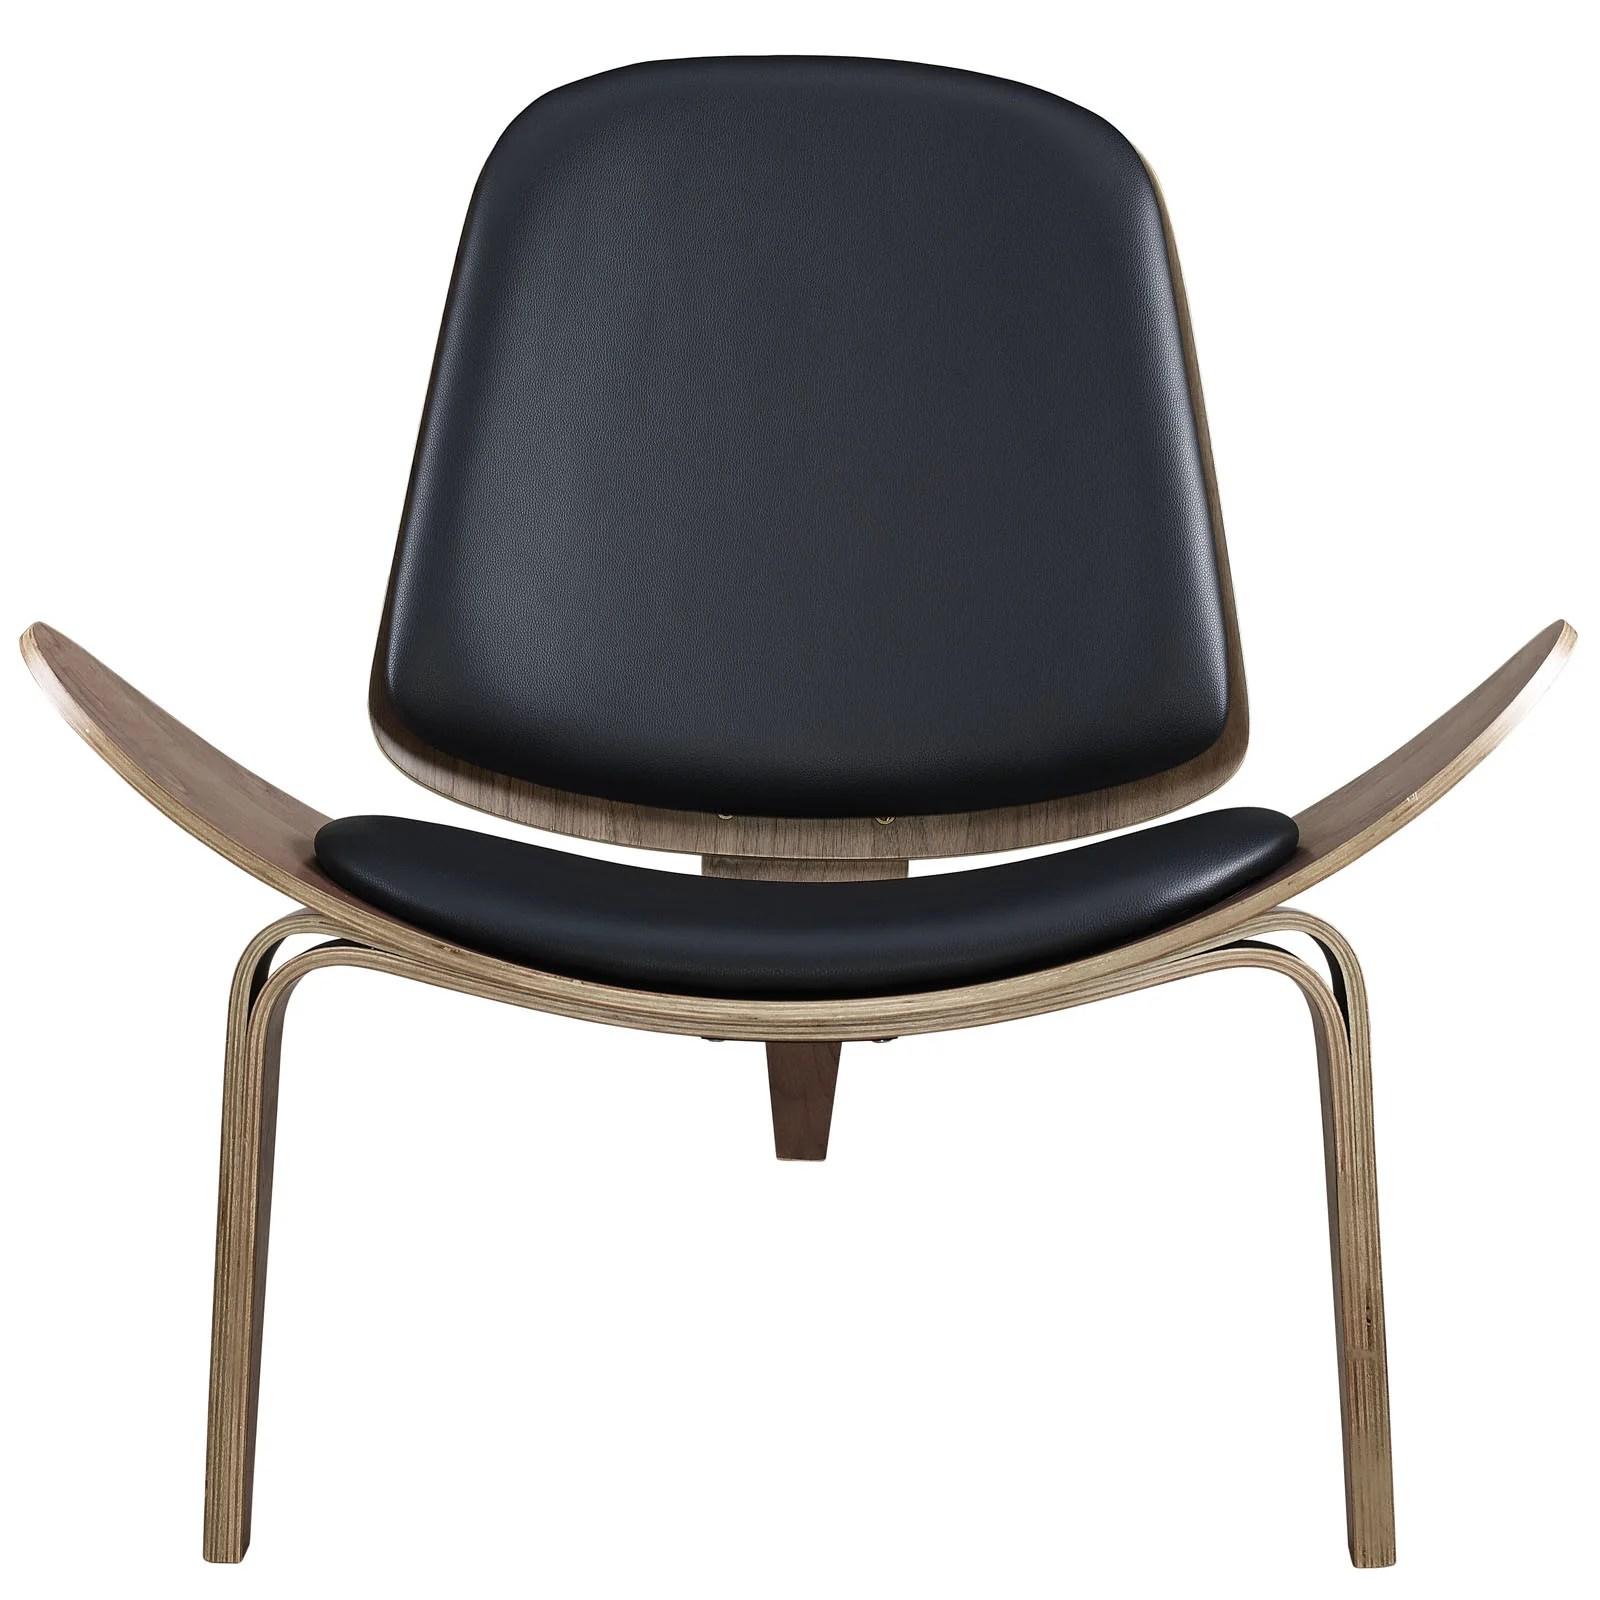 shell chair replica best compact high hans wegner vinyl emfurn j style